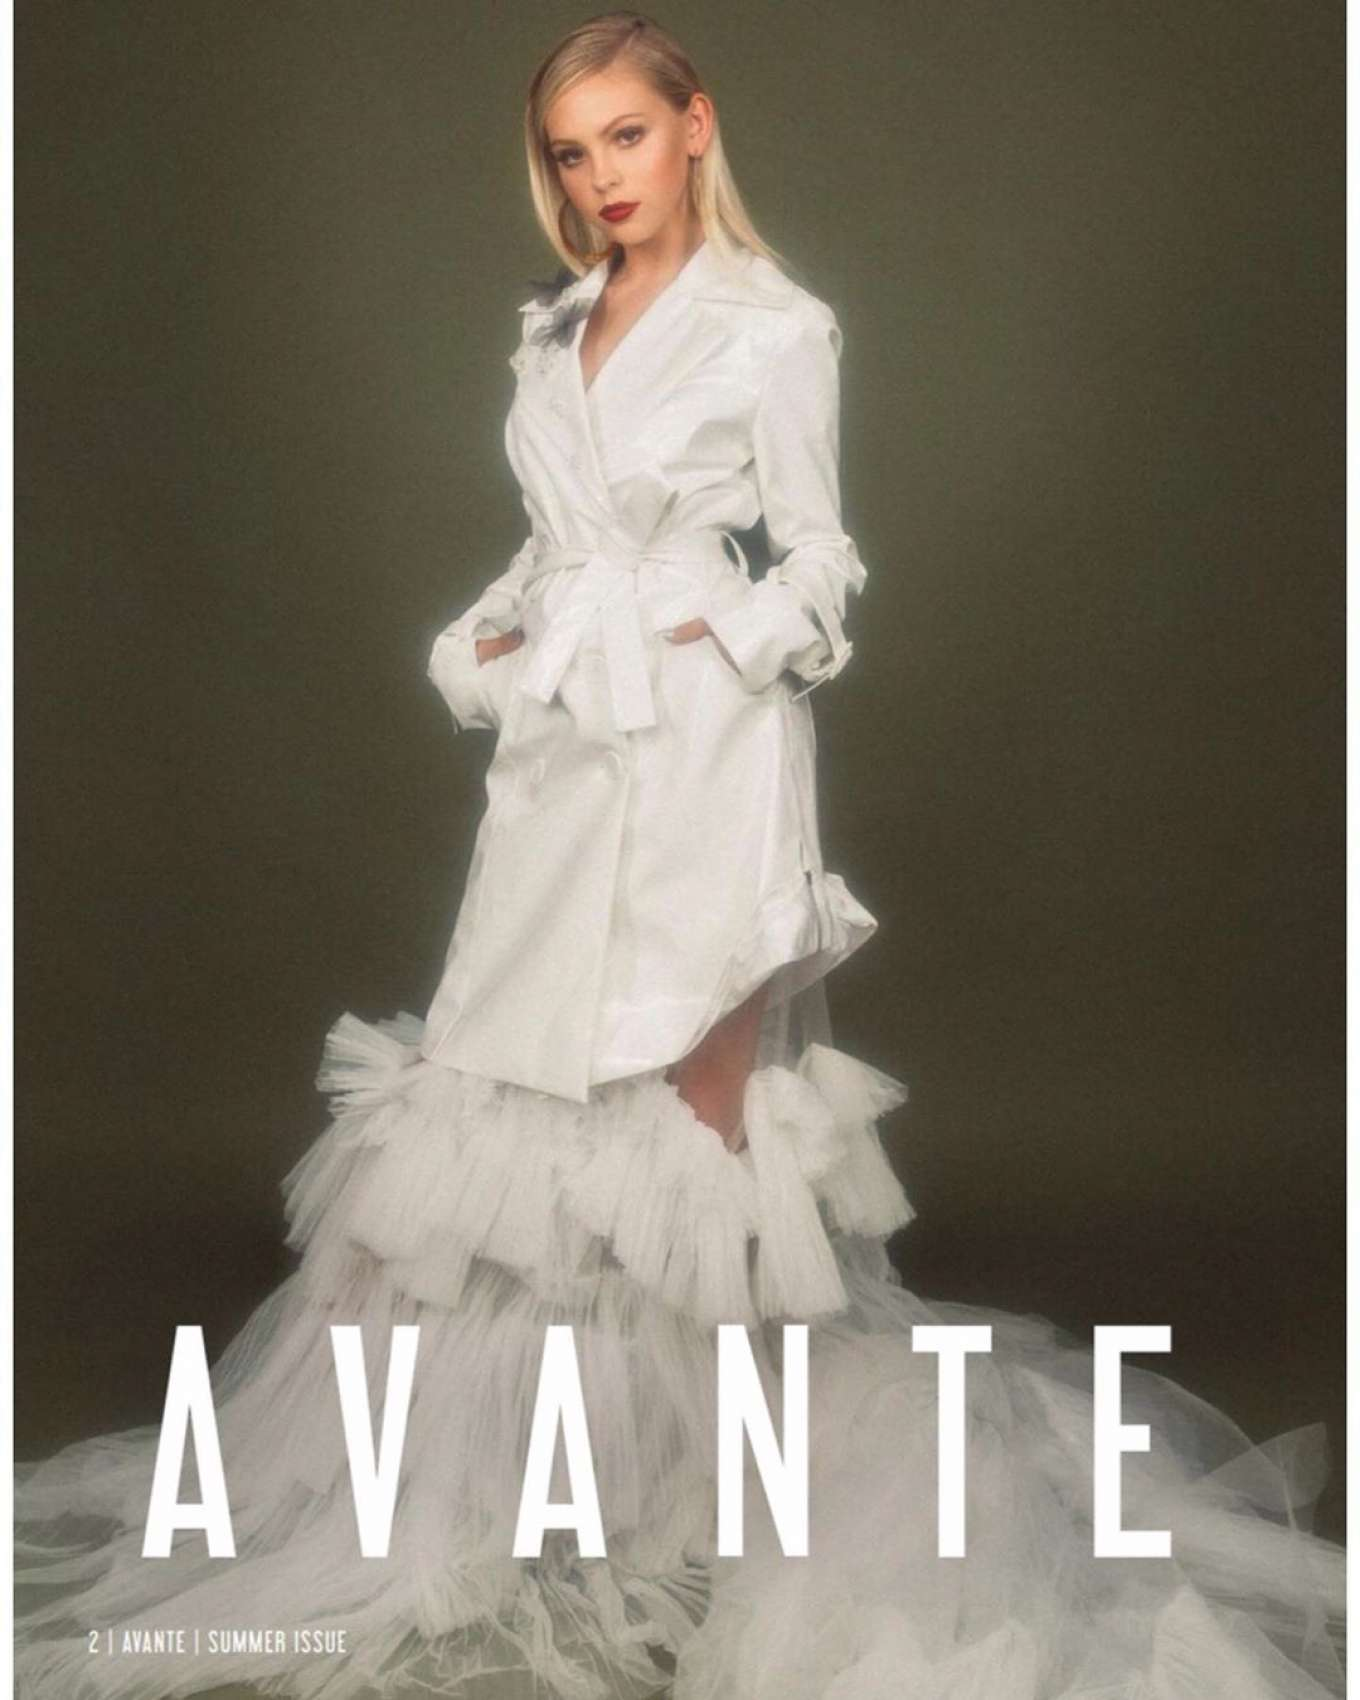 Jordyn Jones 2019 : Jordyn Jones – Avante Magazine 2019 adds-01